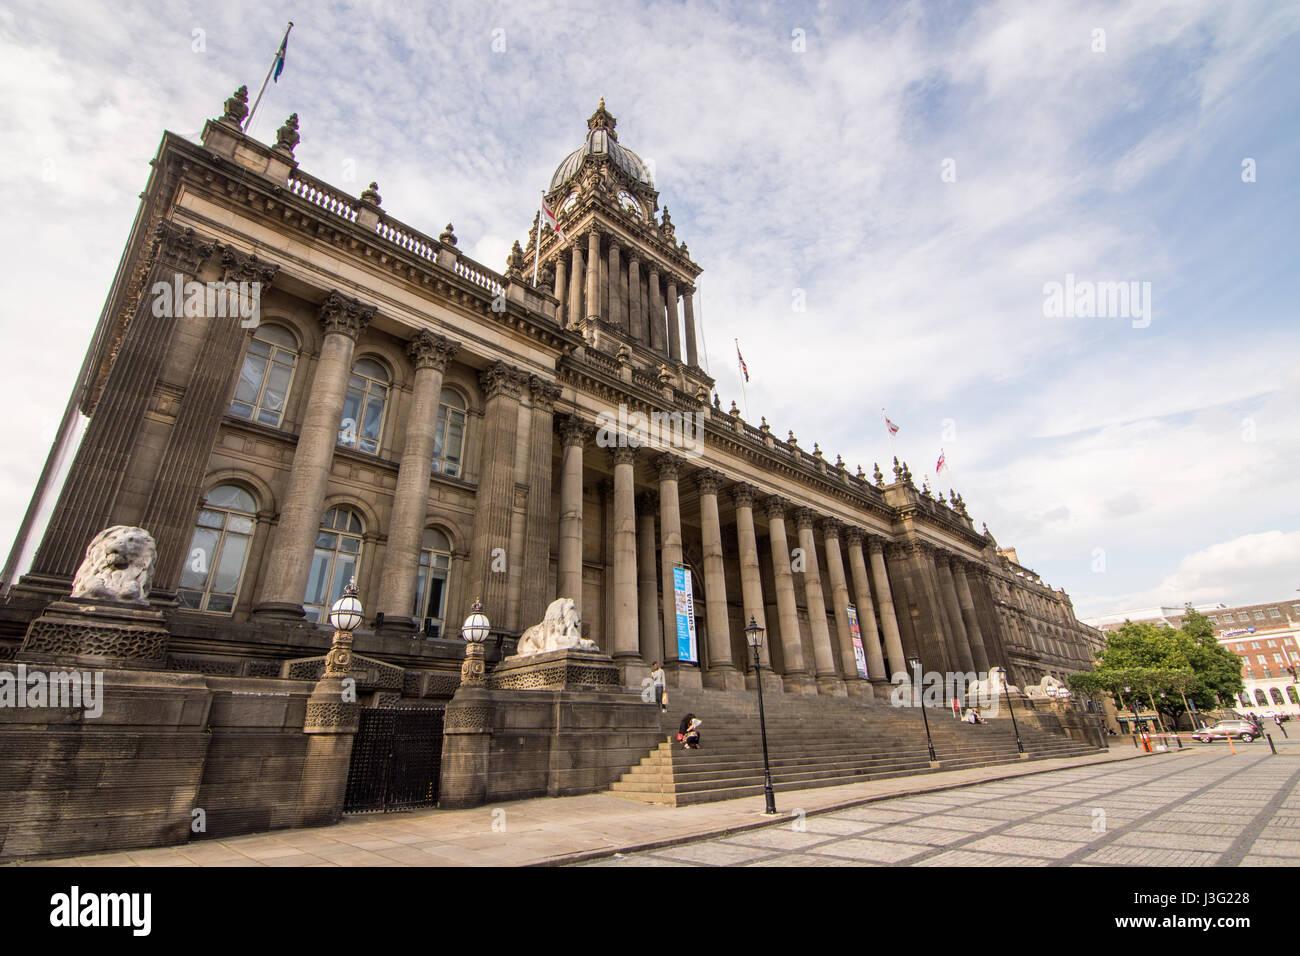 Leeds, England, UK - June 29, 2015: The neoclassical Leeds Town Hall on The Headrow street. - Stock Image